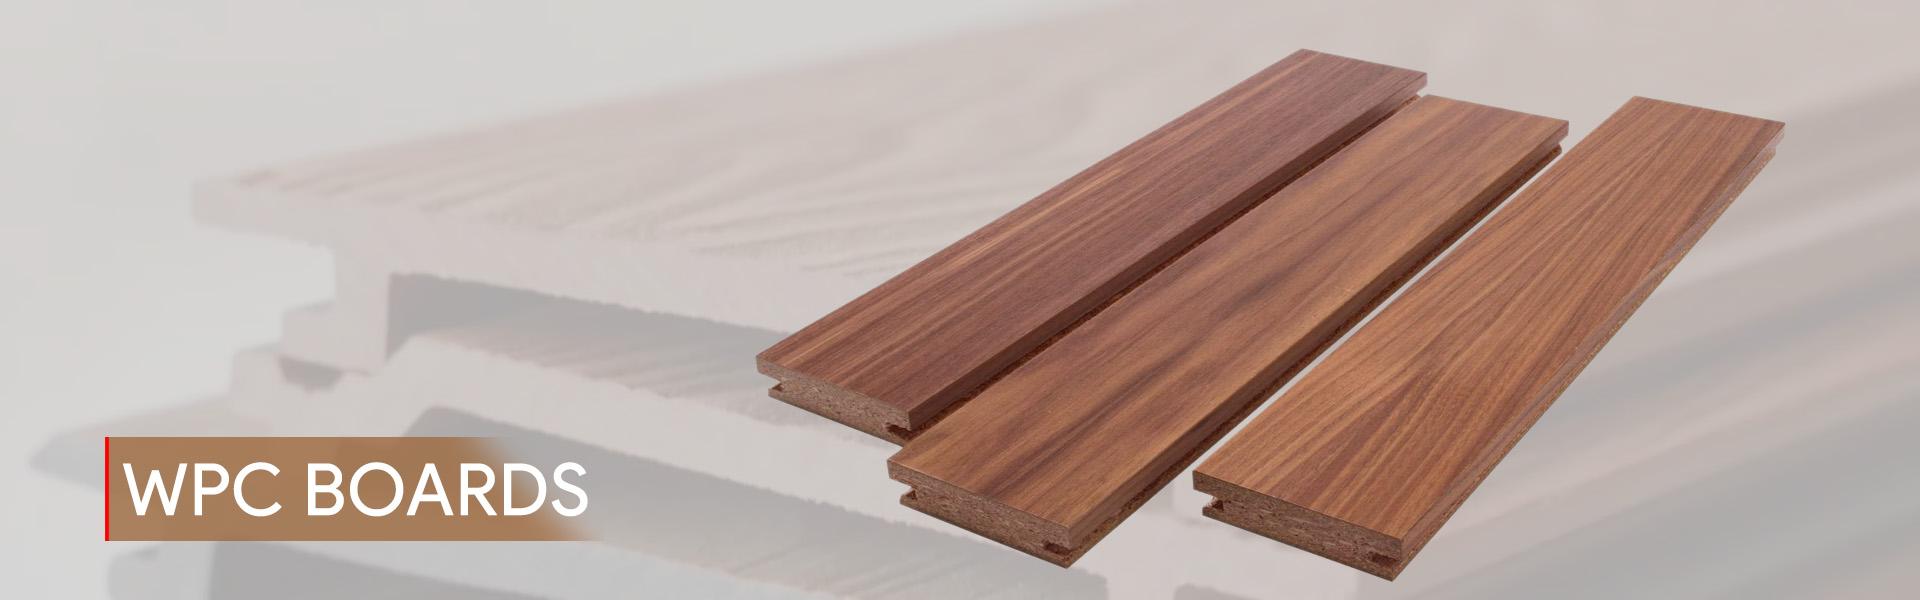 wpc boards manufacturer